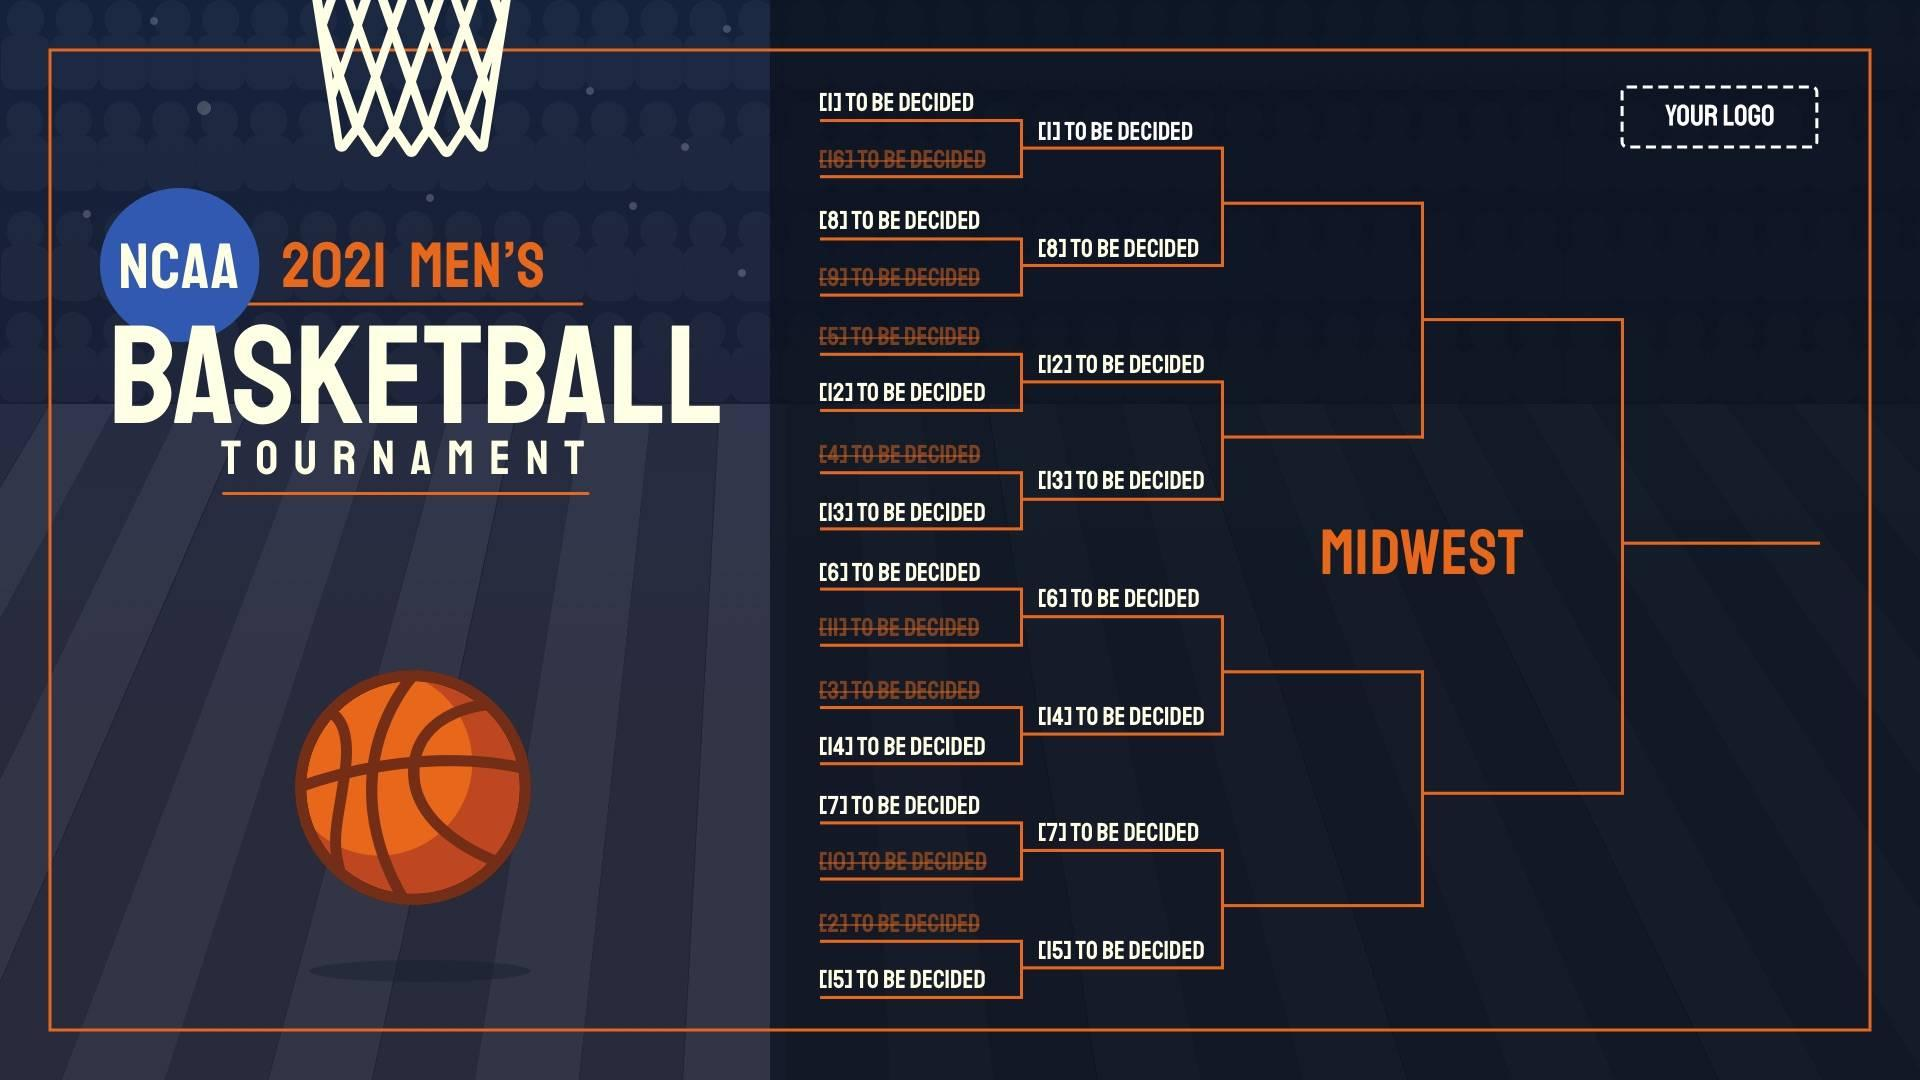 2021 NCAA Men's Tournament Digital Signage Template